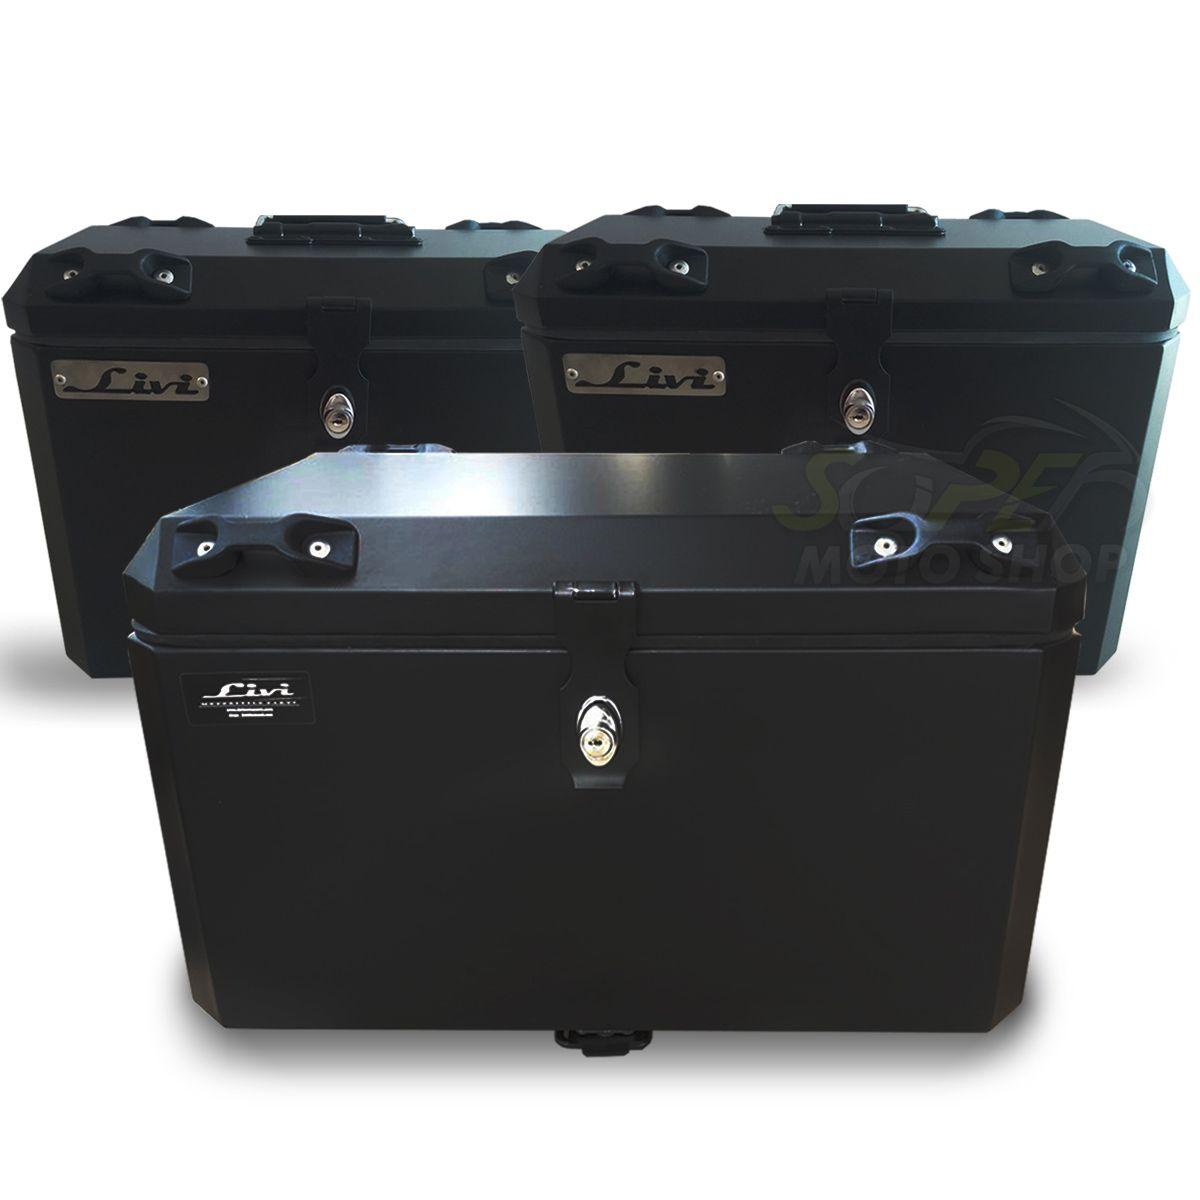 Kit Baú / Bauleto Alumínio Traseiro Top Case + Lateral Side Case + Suporte Para Baú de Alumínio Livi - Africa Twin CRF 1000 L - Honda